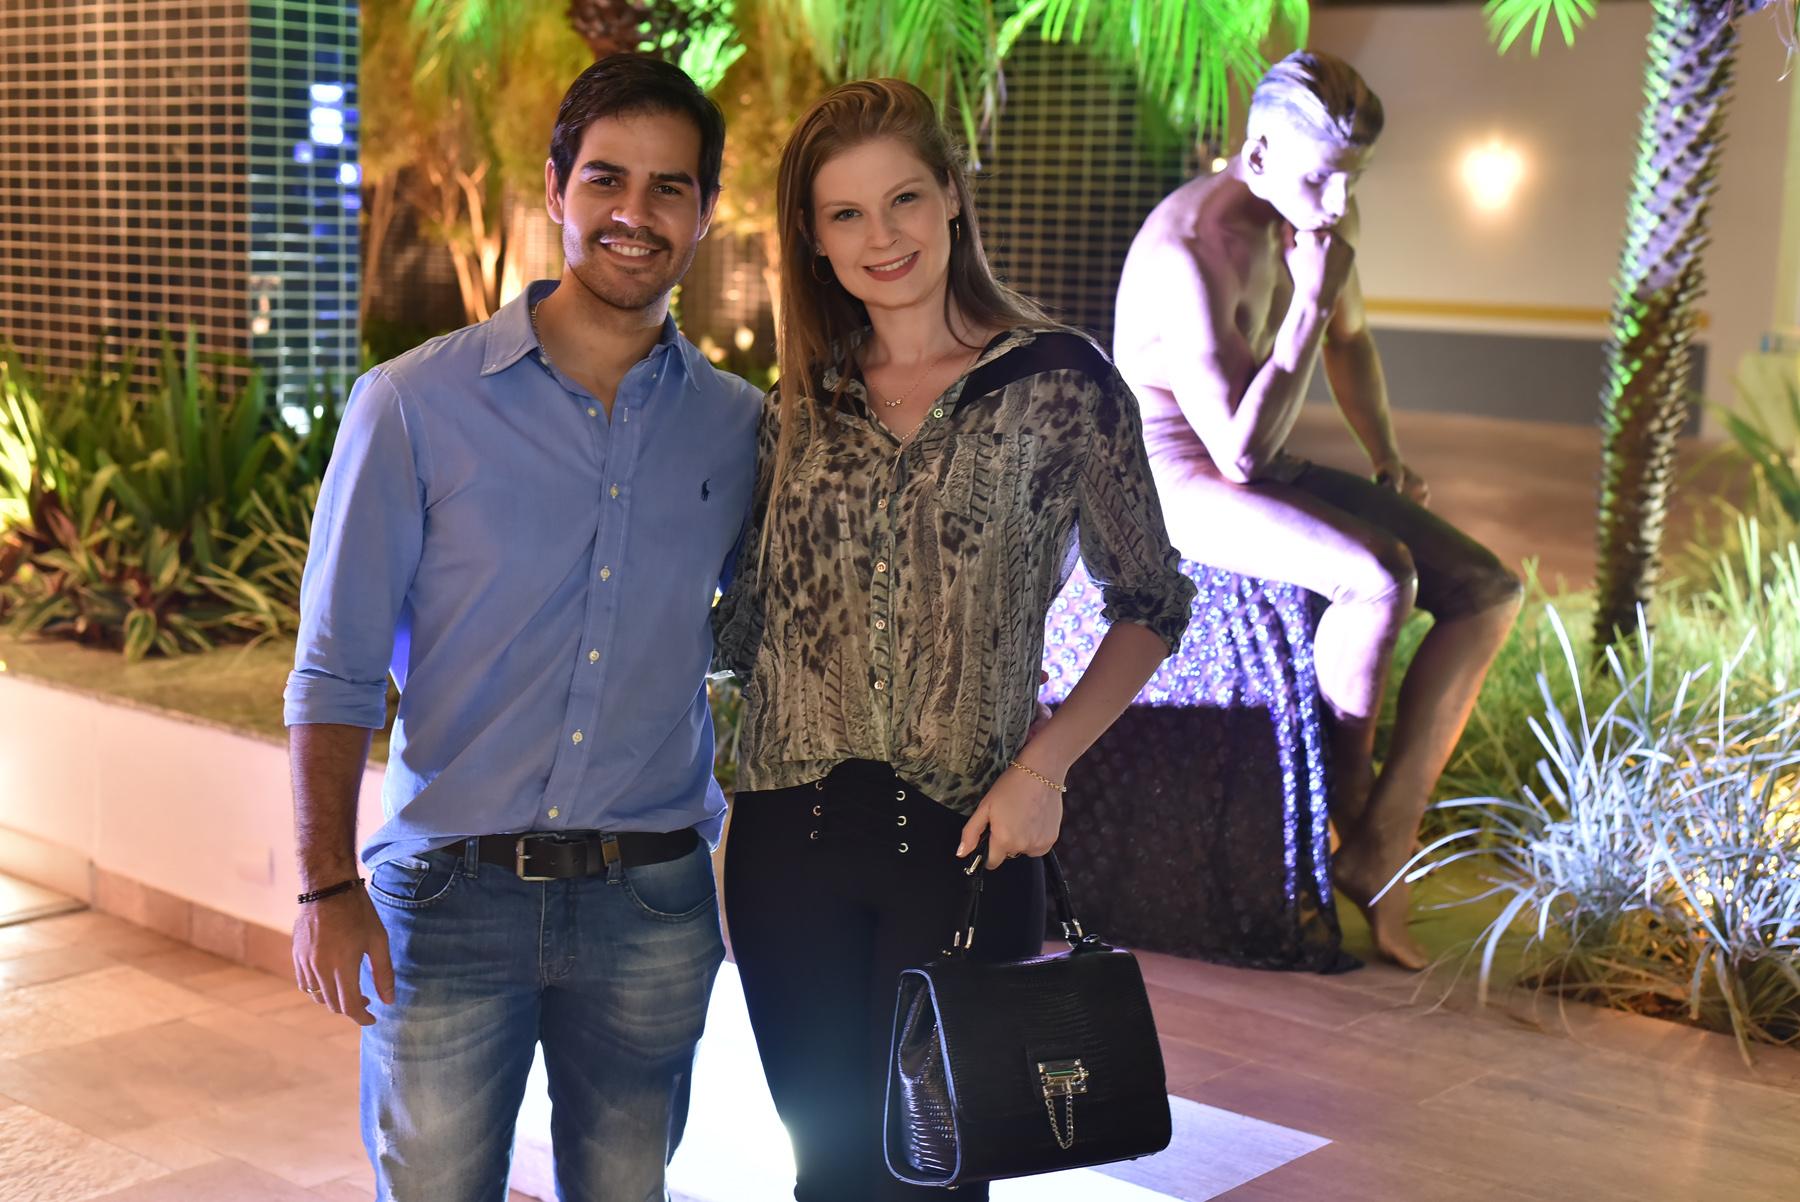 Orlando Lopes e esposa Jessica na entrega do Edifício Rodin.